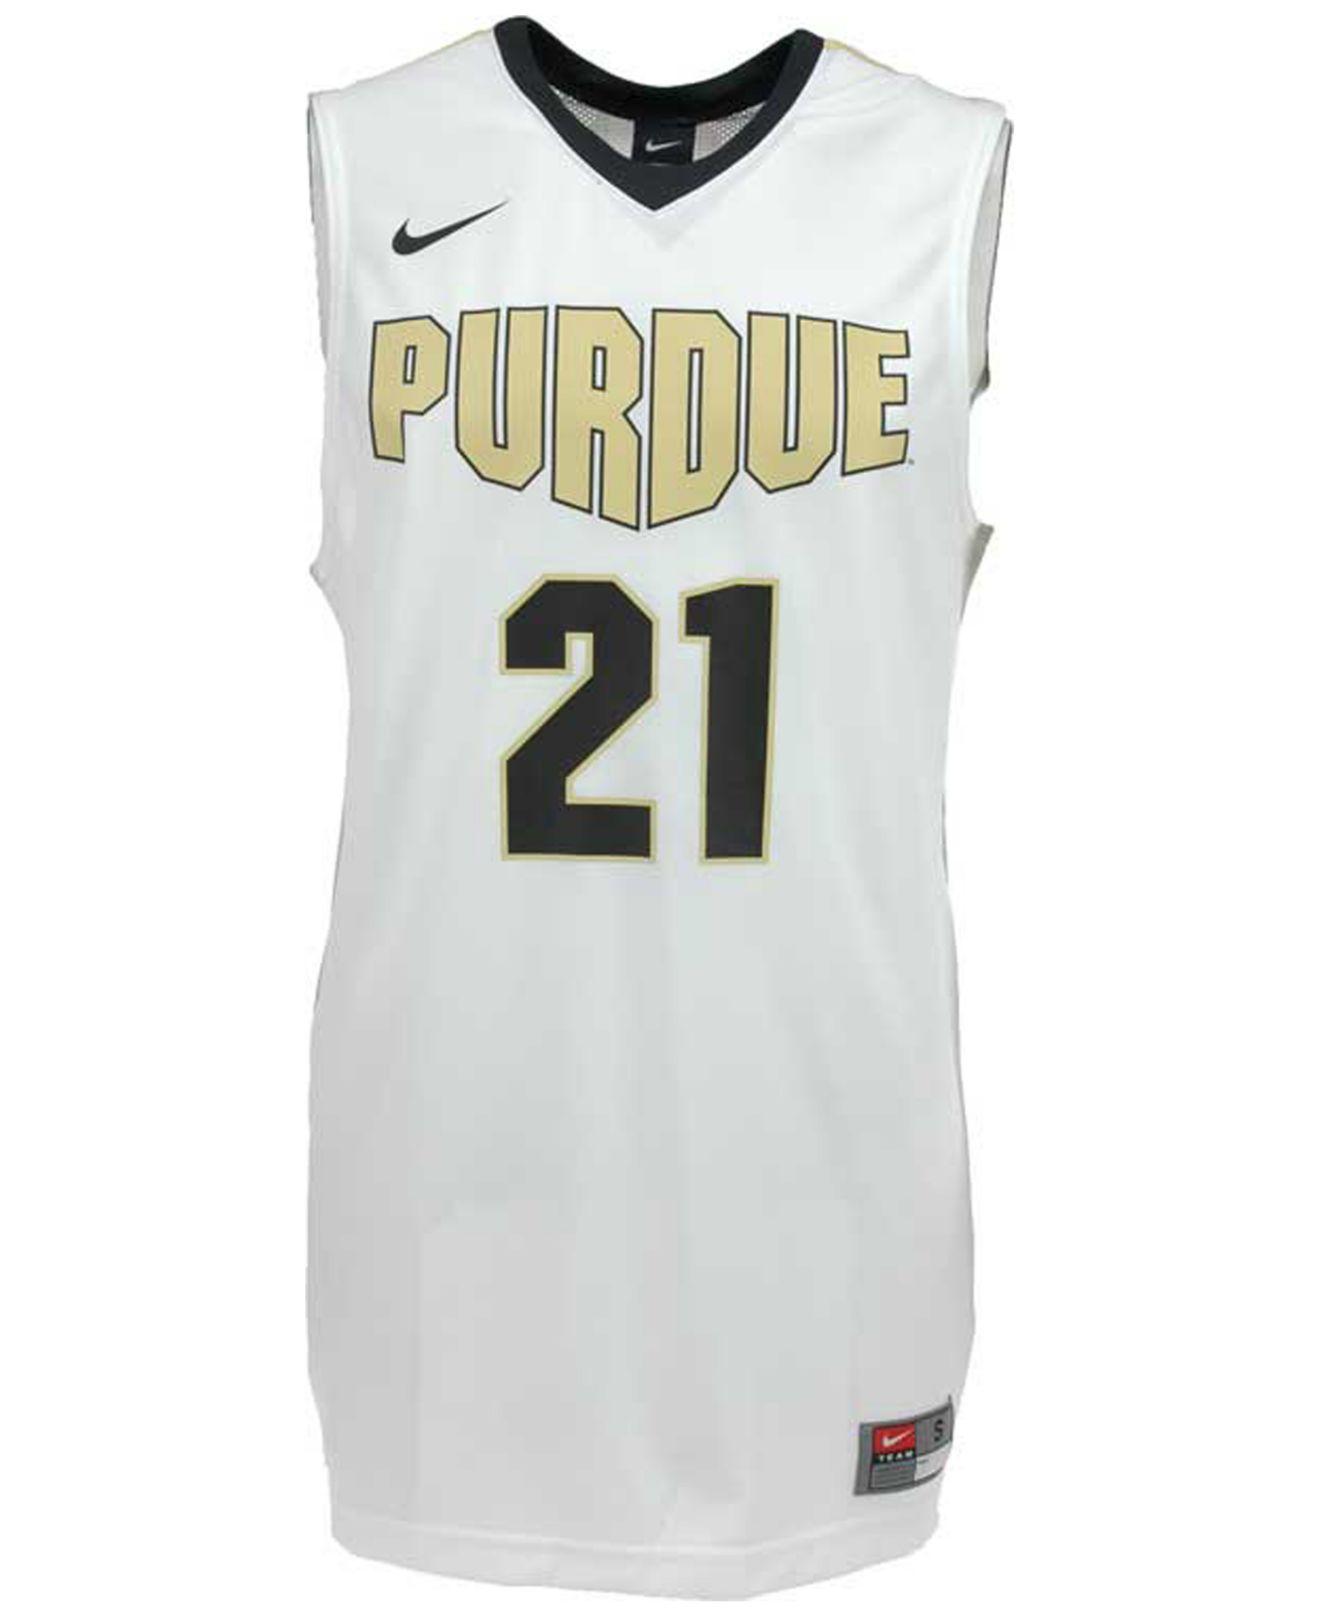 pretty nice 07809 b57f5 White Men'S Purdue Boilermakers Basketball Jersey